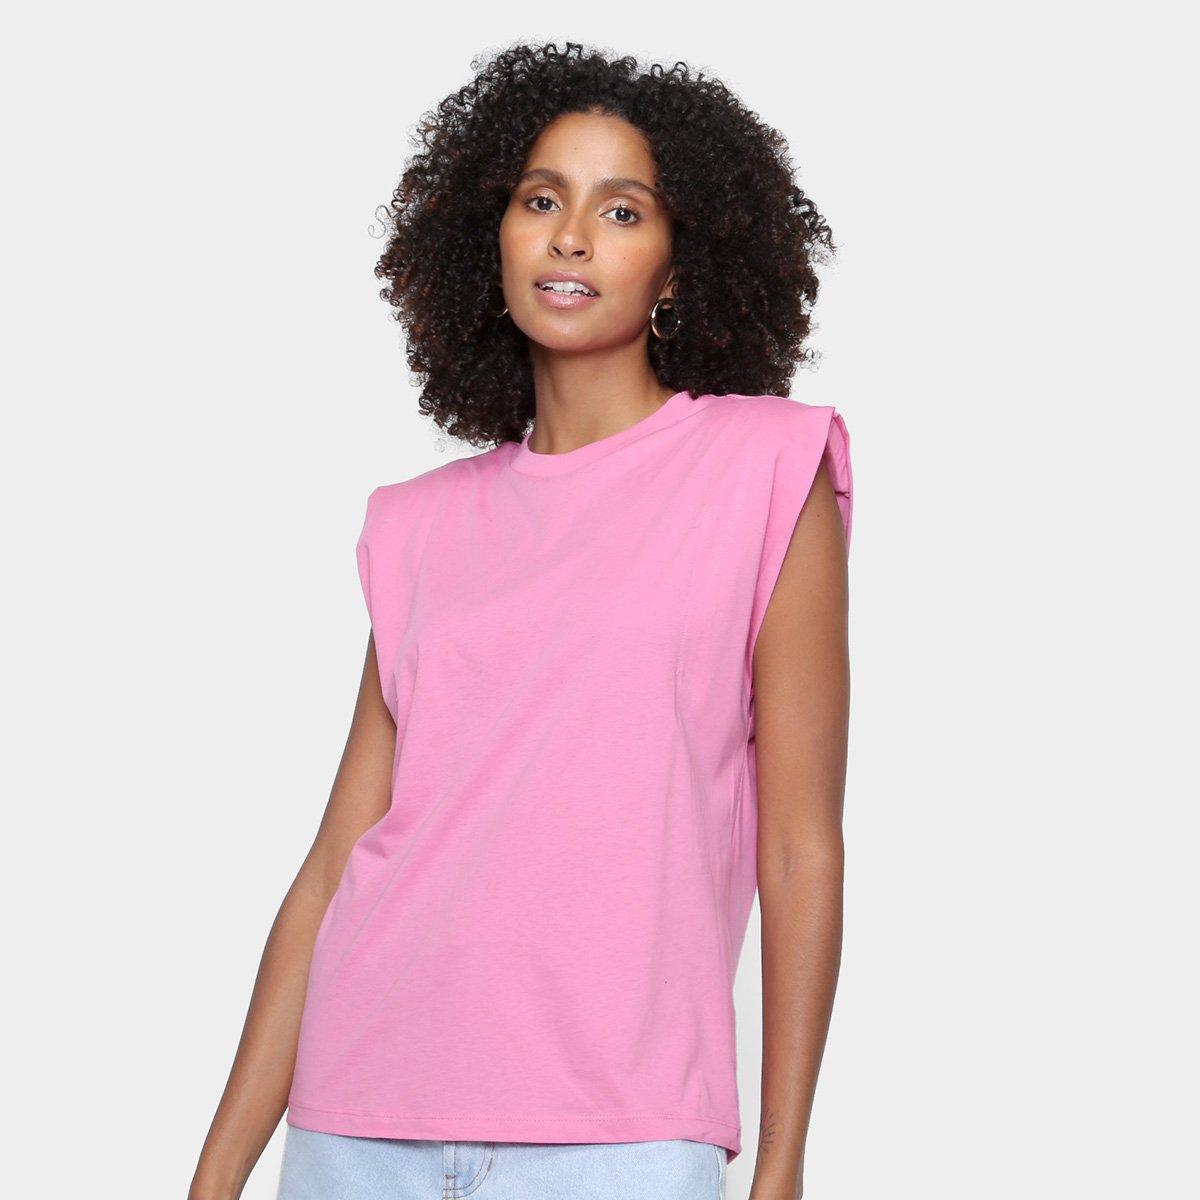 Camiseta Colcci Muscle Tee Feminina